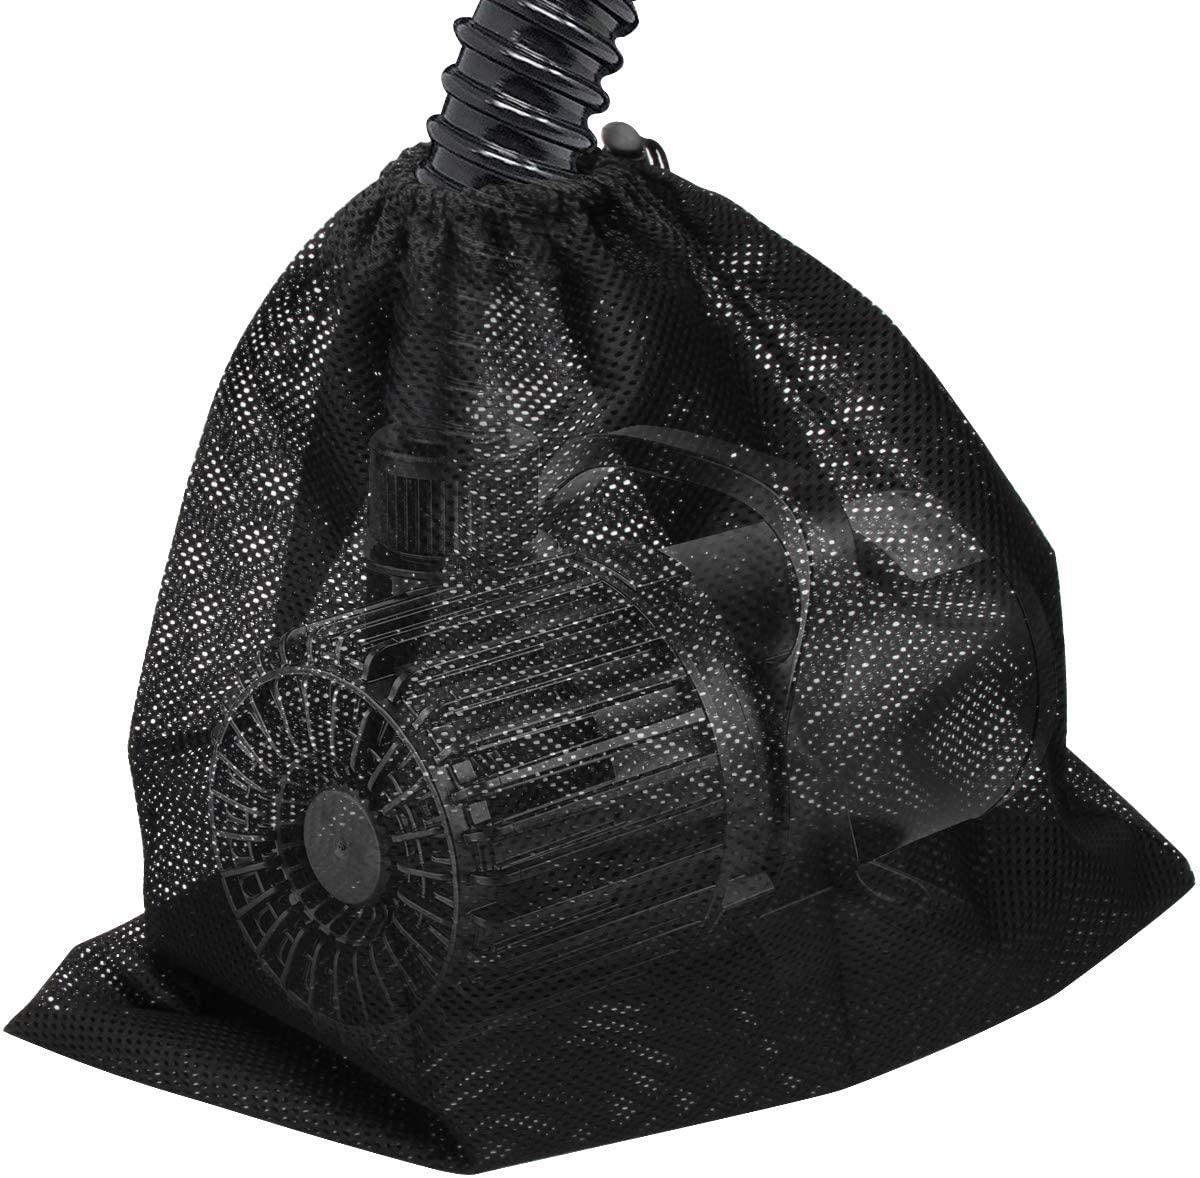 Catcan Pond Pump Filter Bag, Pump Barrier Mesh Bag, Pump Barrier Bag, Suitable for Most Pumps, Nylon Material Fabric, Bag Size 12